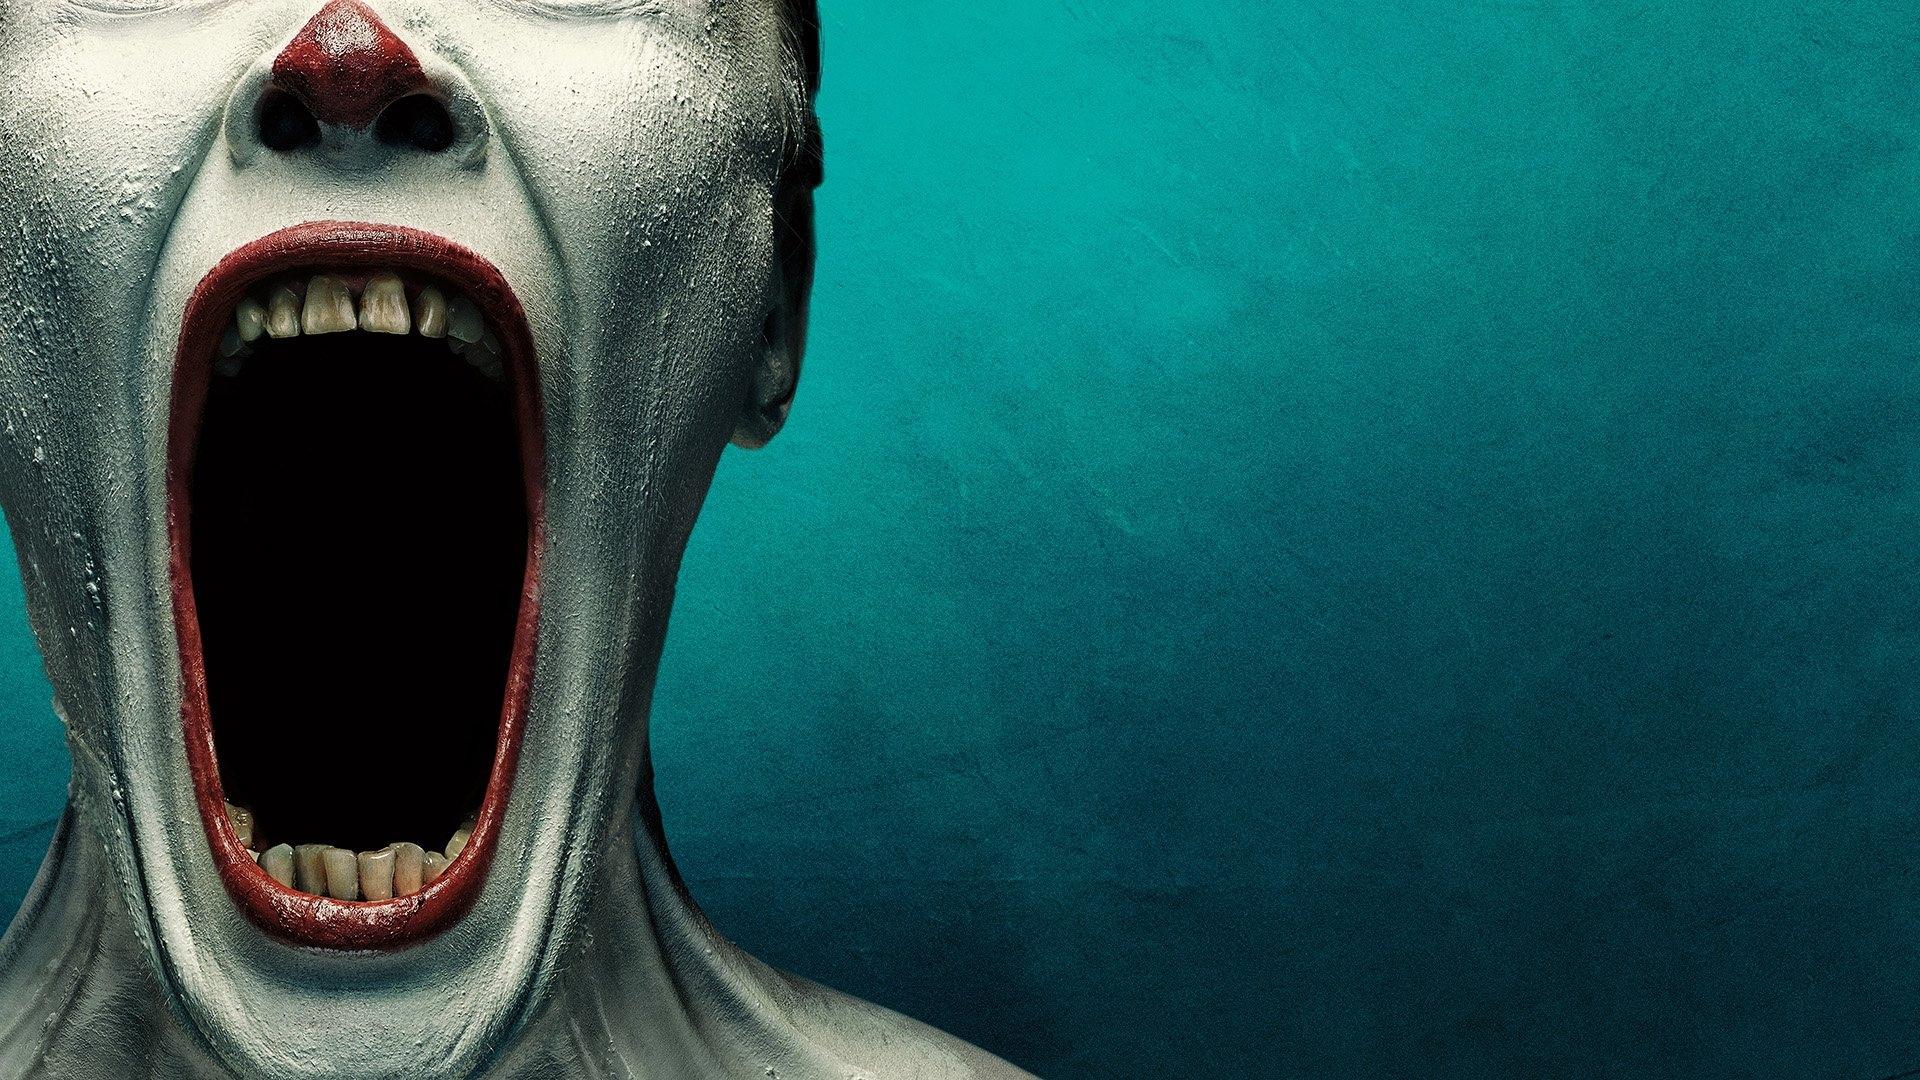 american horror story: freak show full hd fond d'écran and arrière